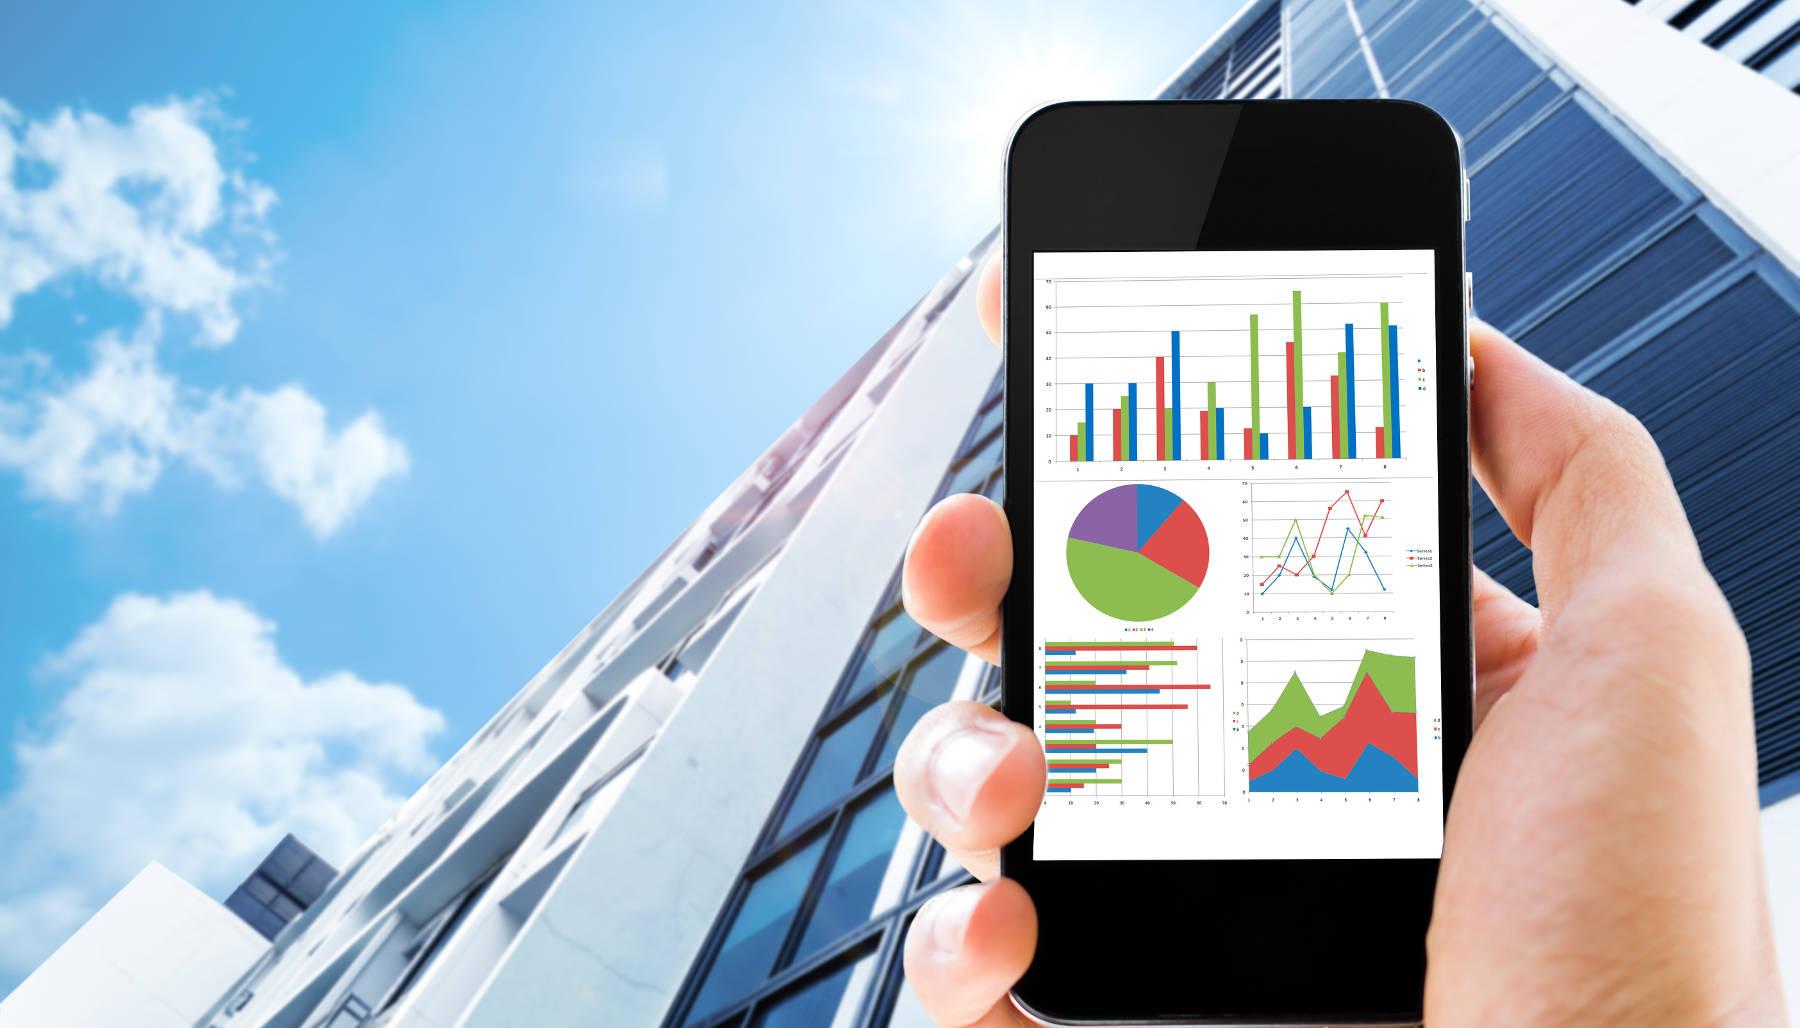 Building Analysis | Fentress Inc